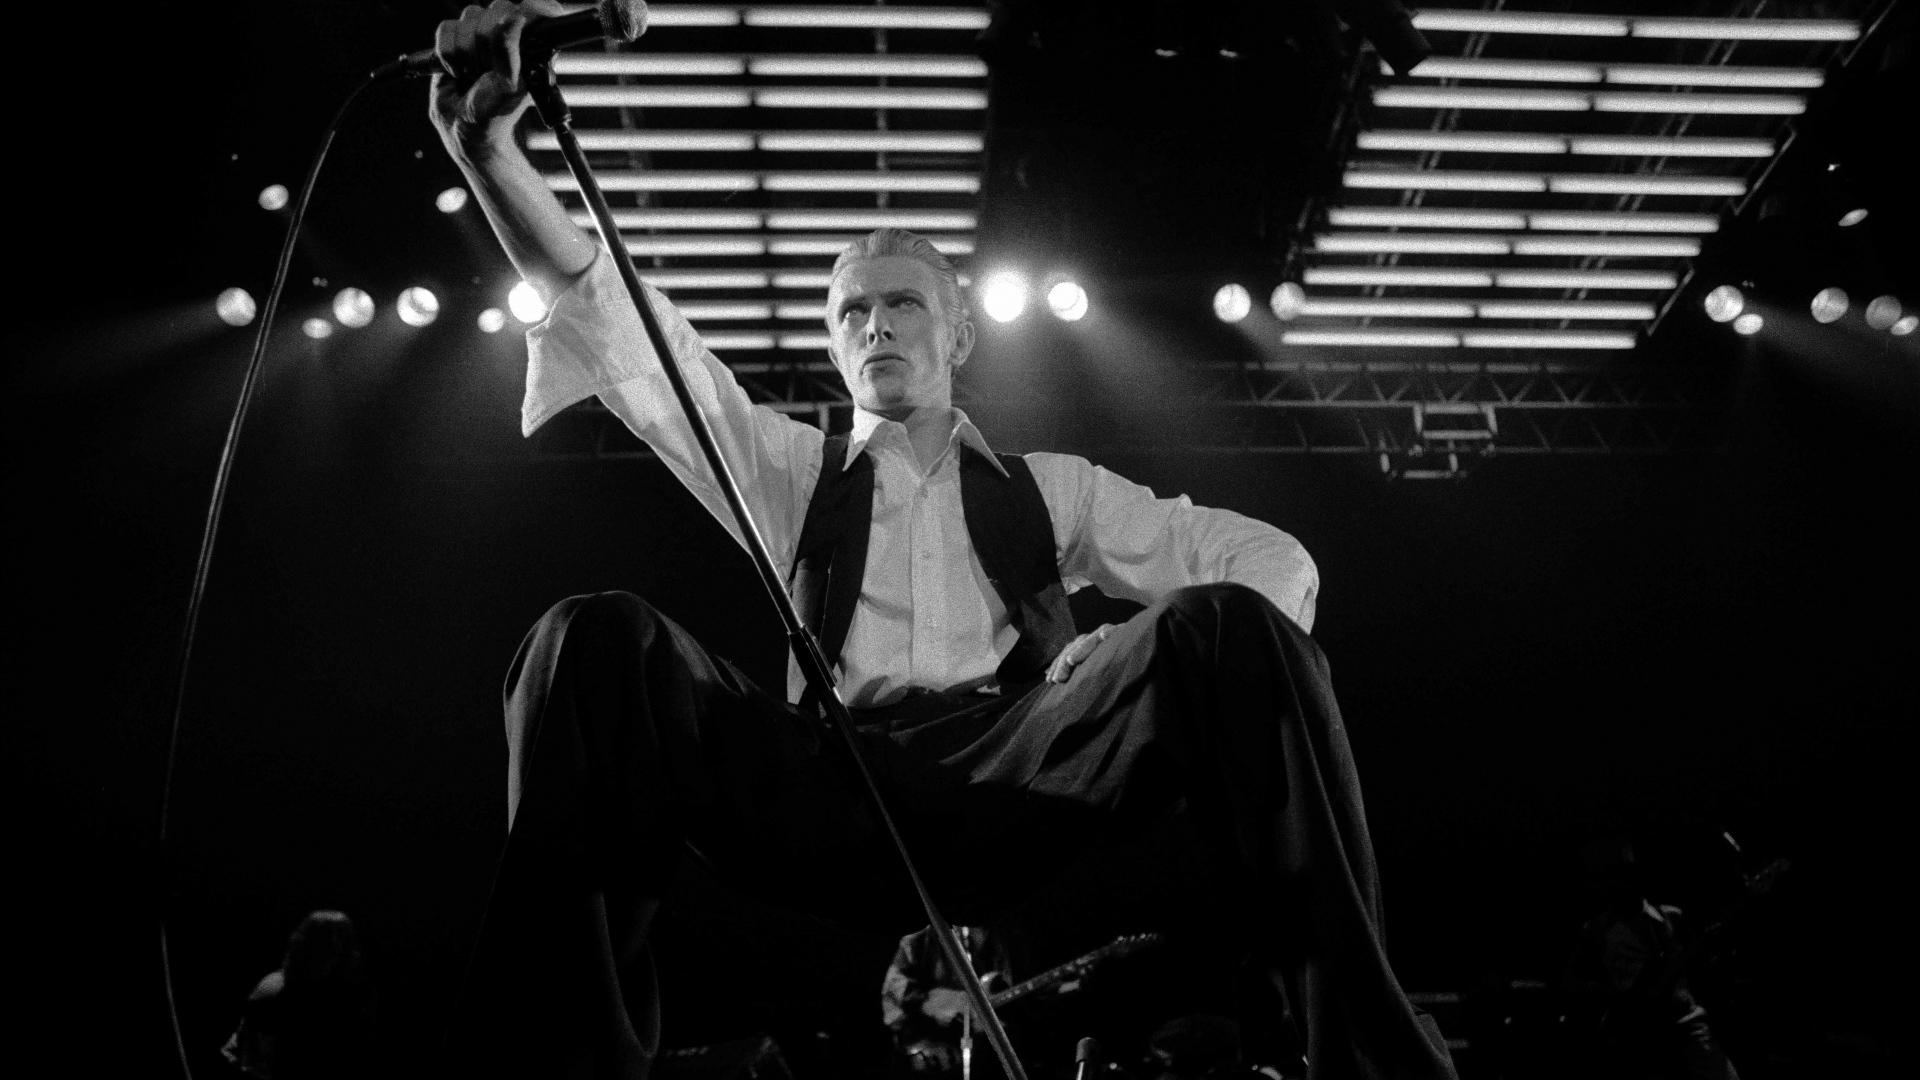 Wallpaper David Bowie, musician, monochrome